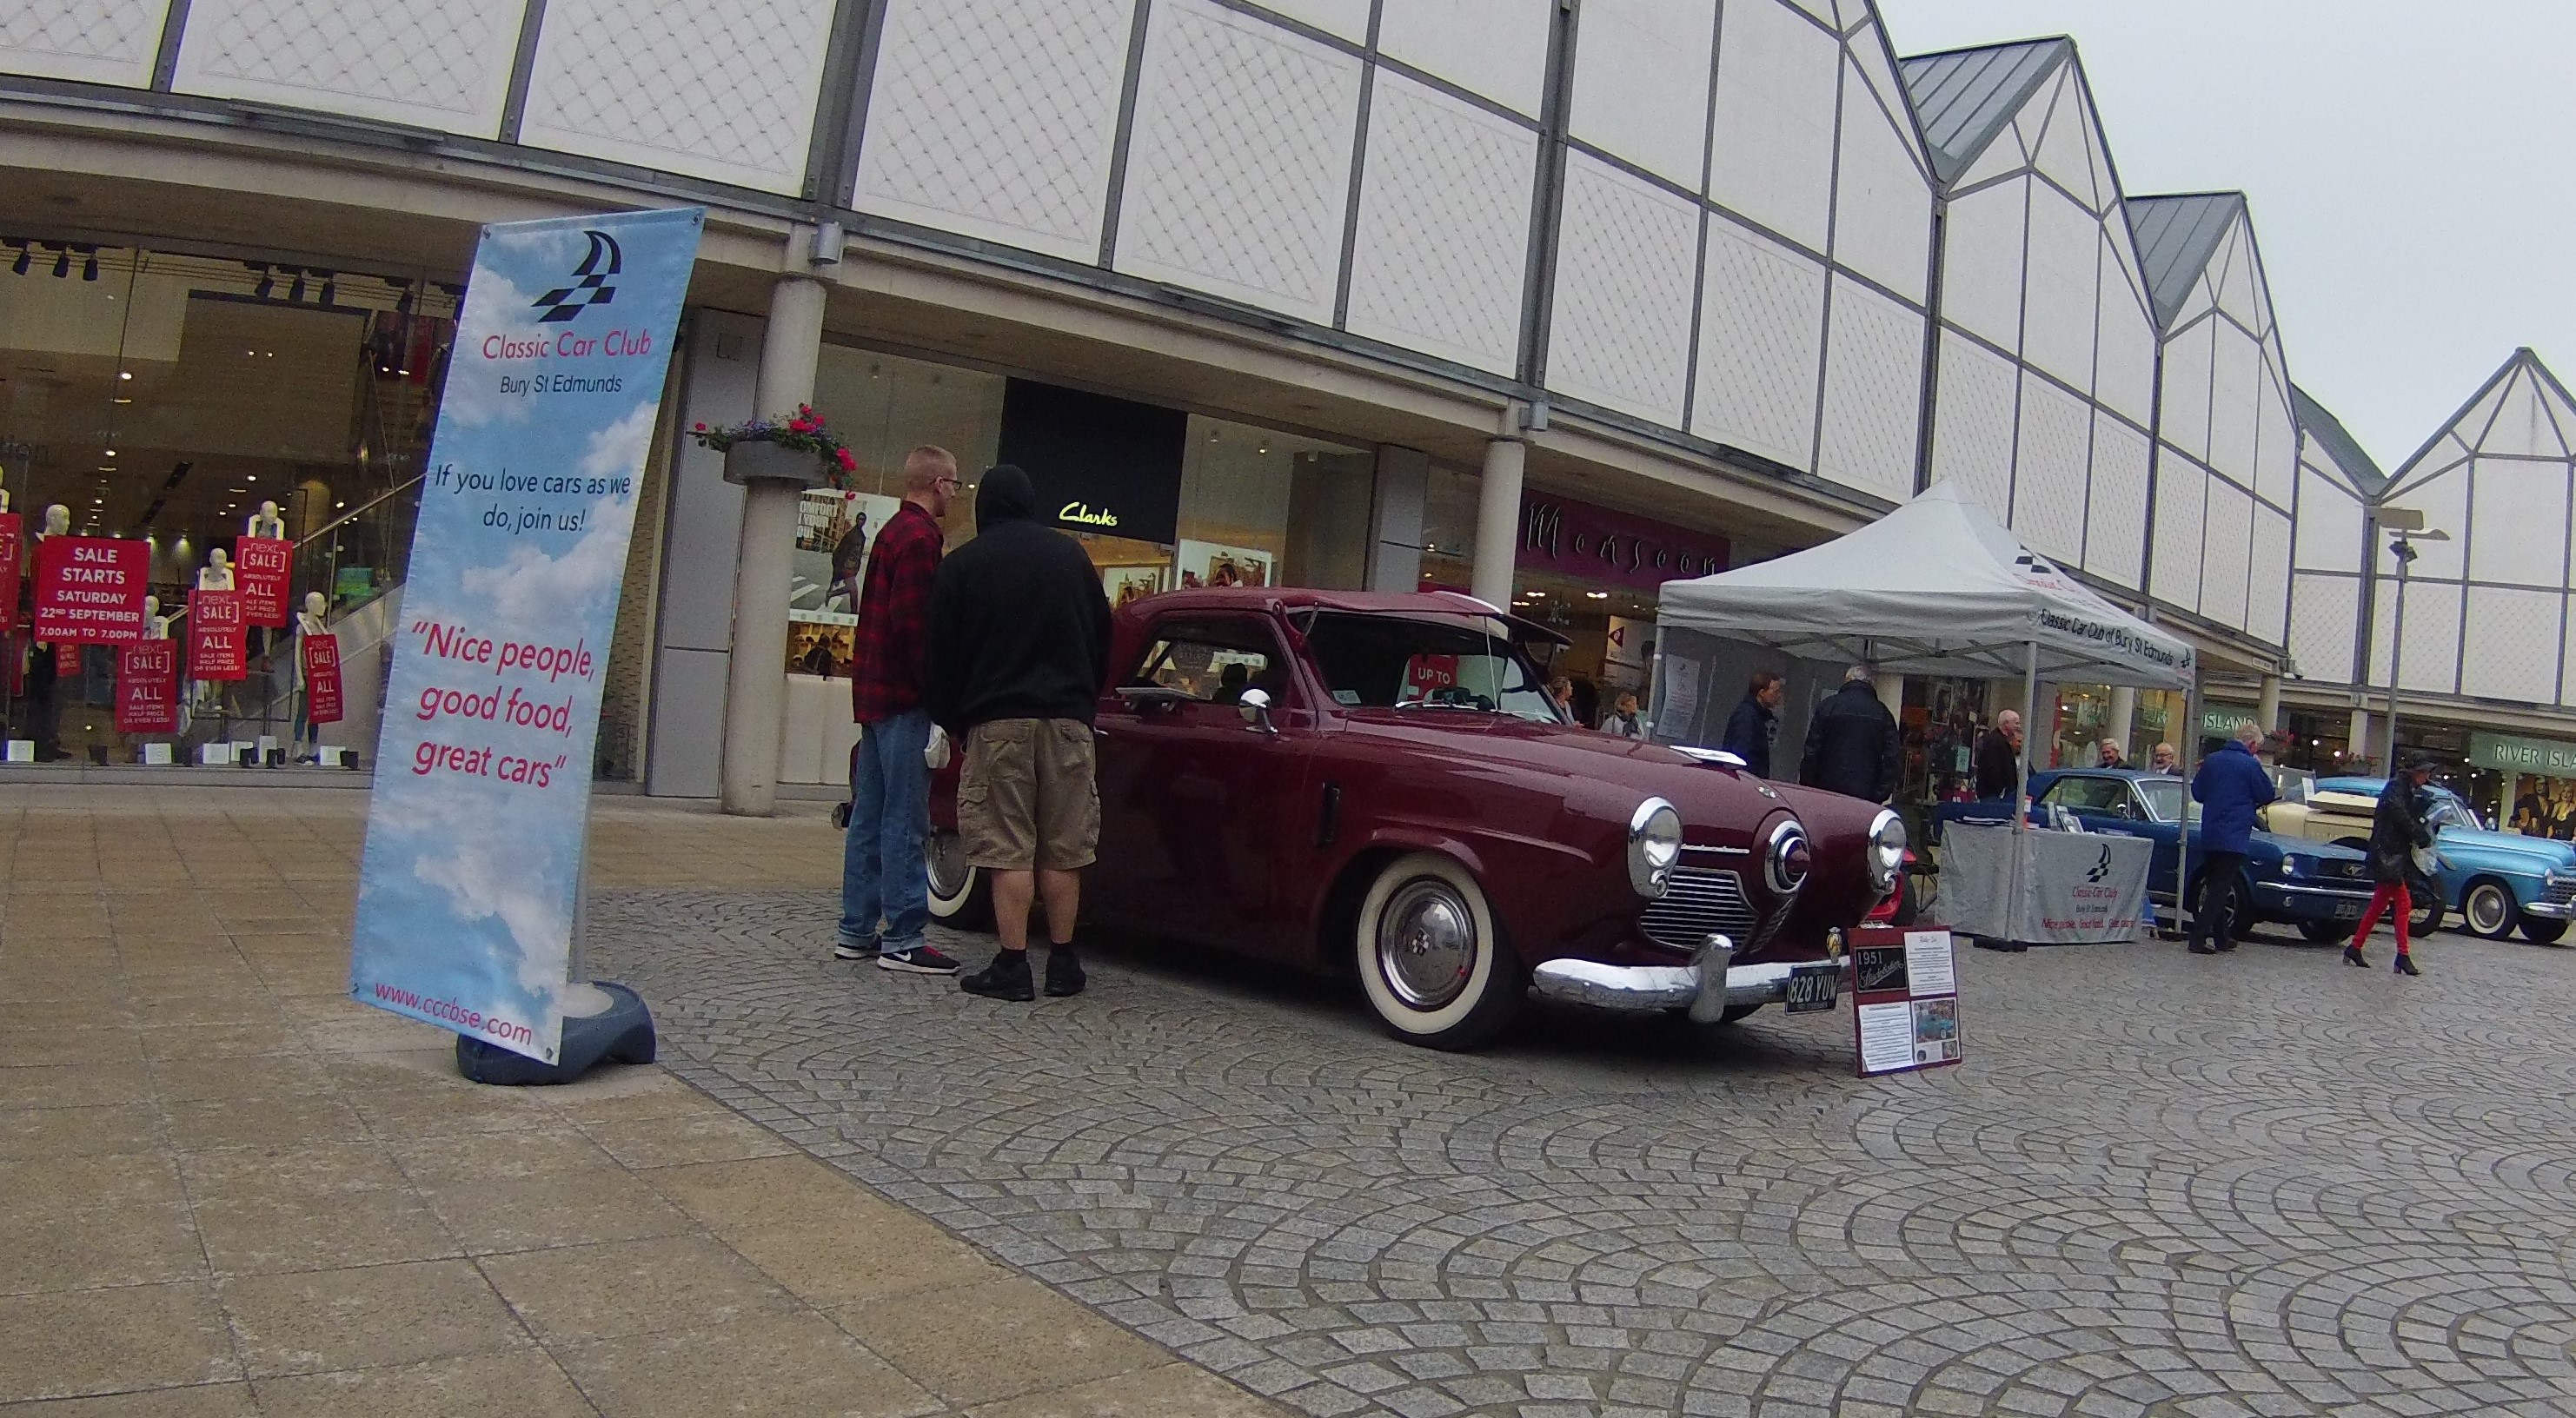 The Classic Car Club of Bury St Edmunds | Trip to GREYHOUND